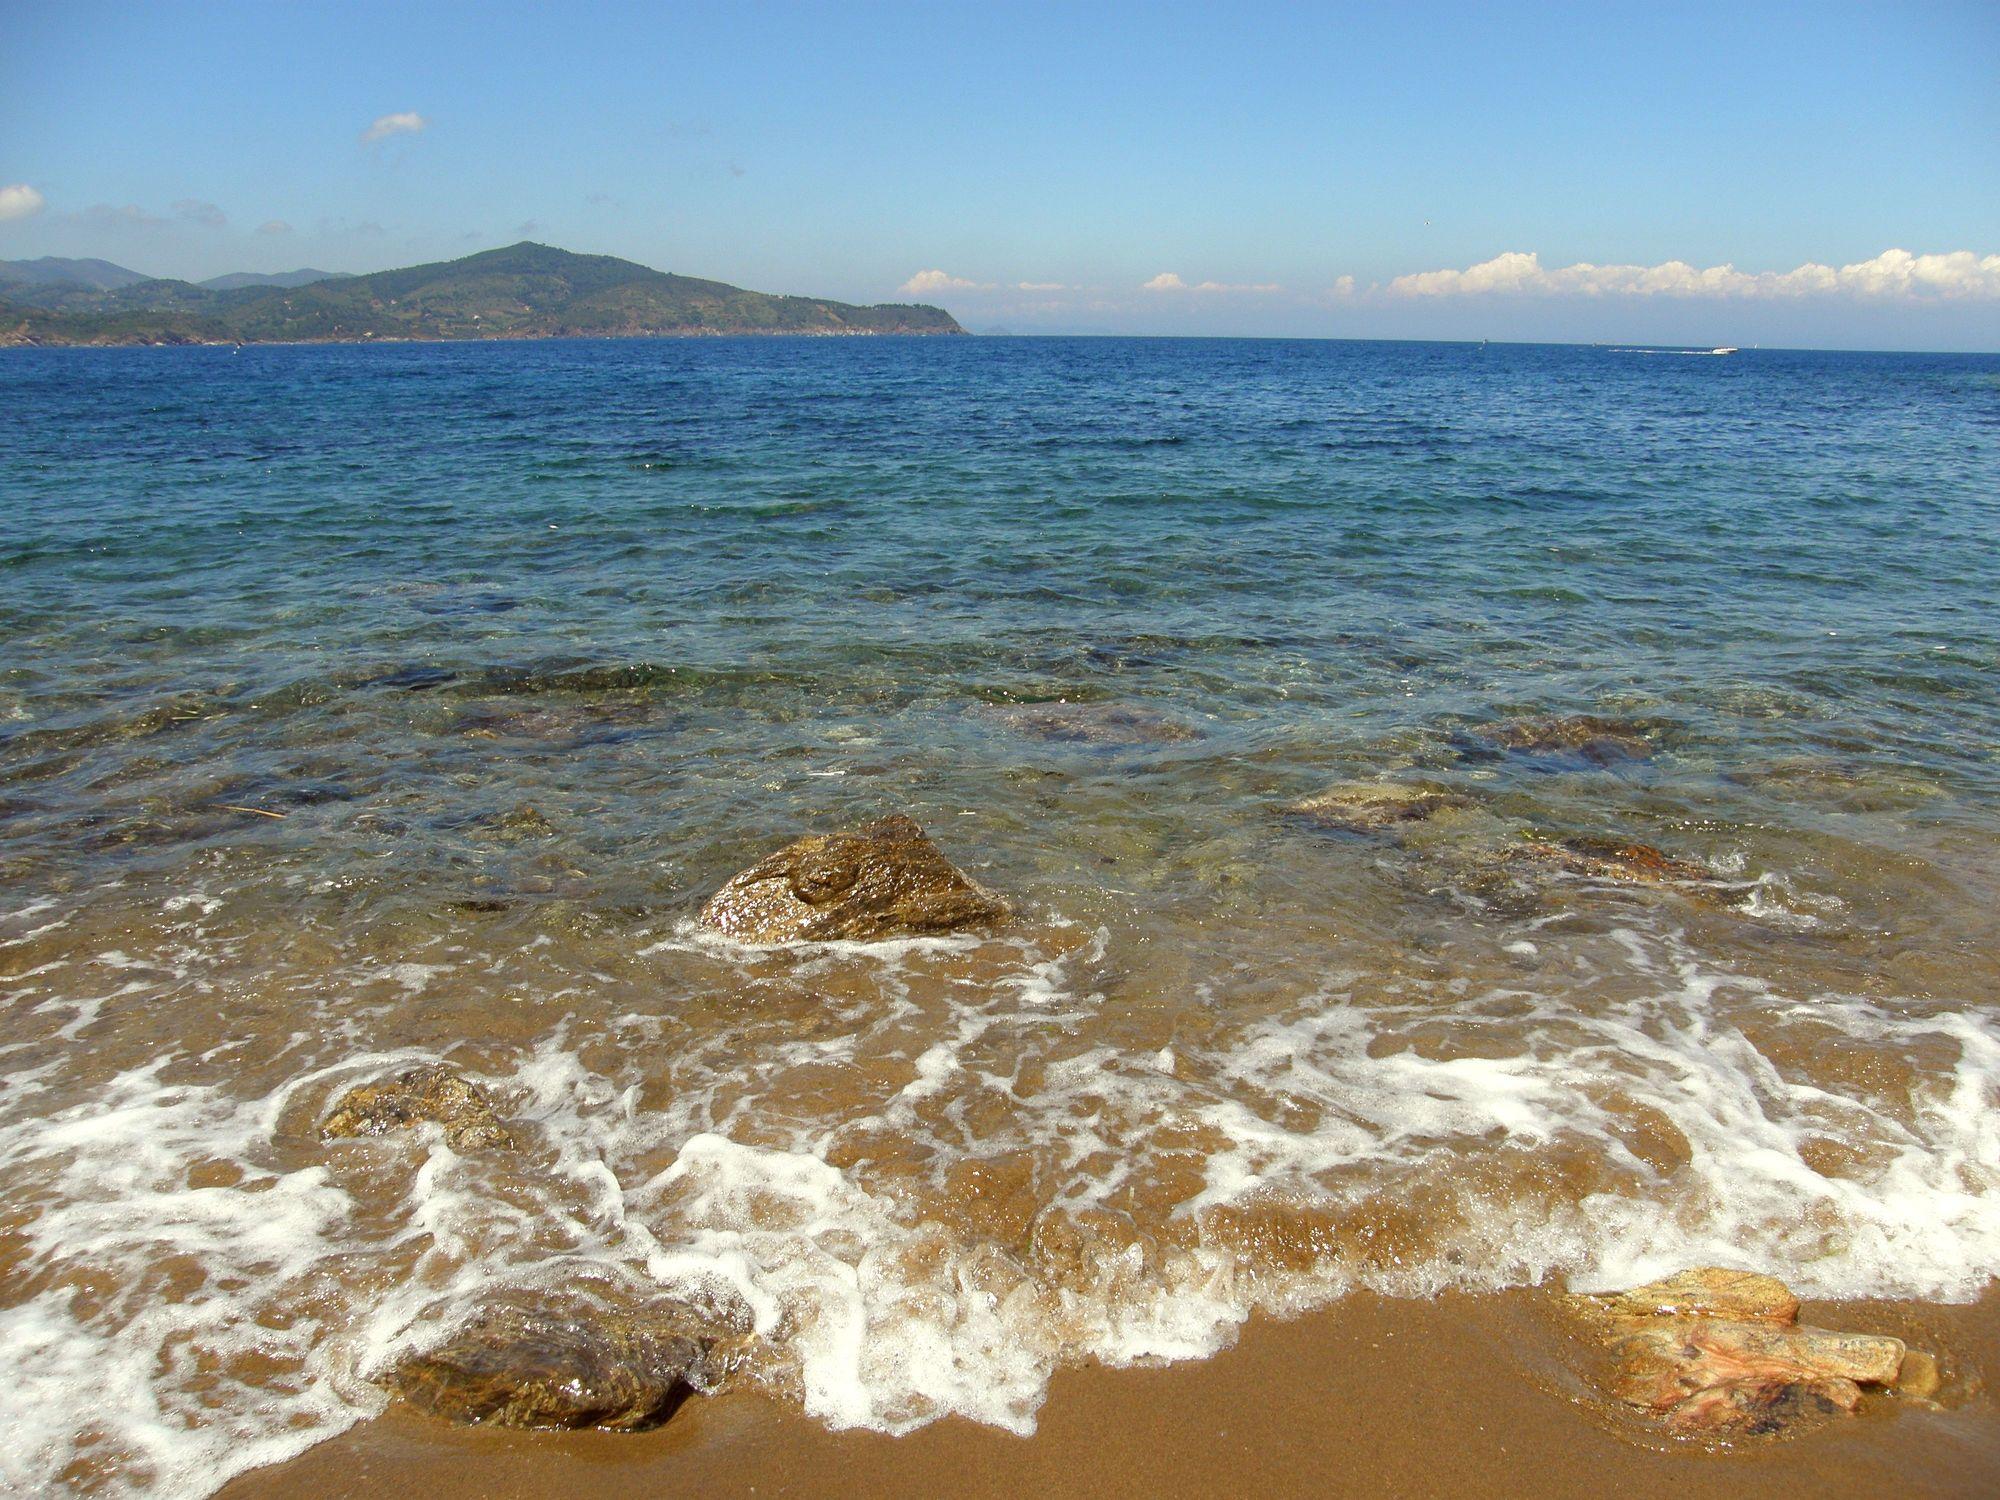 Bild mit Strände, Wellen, Italien, Strand, Meerblick, Meer, Sehnsucht nach Meer